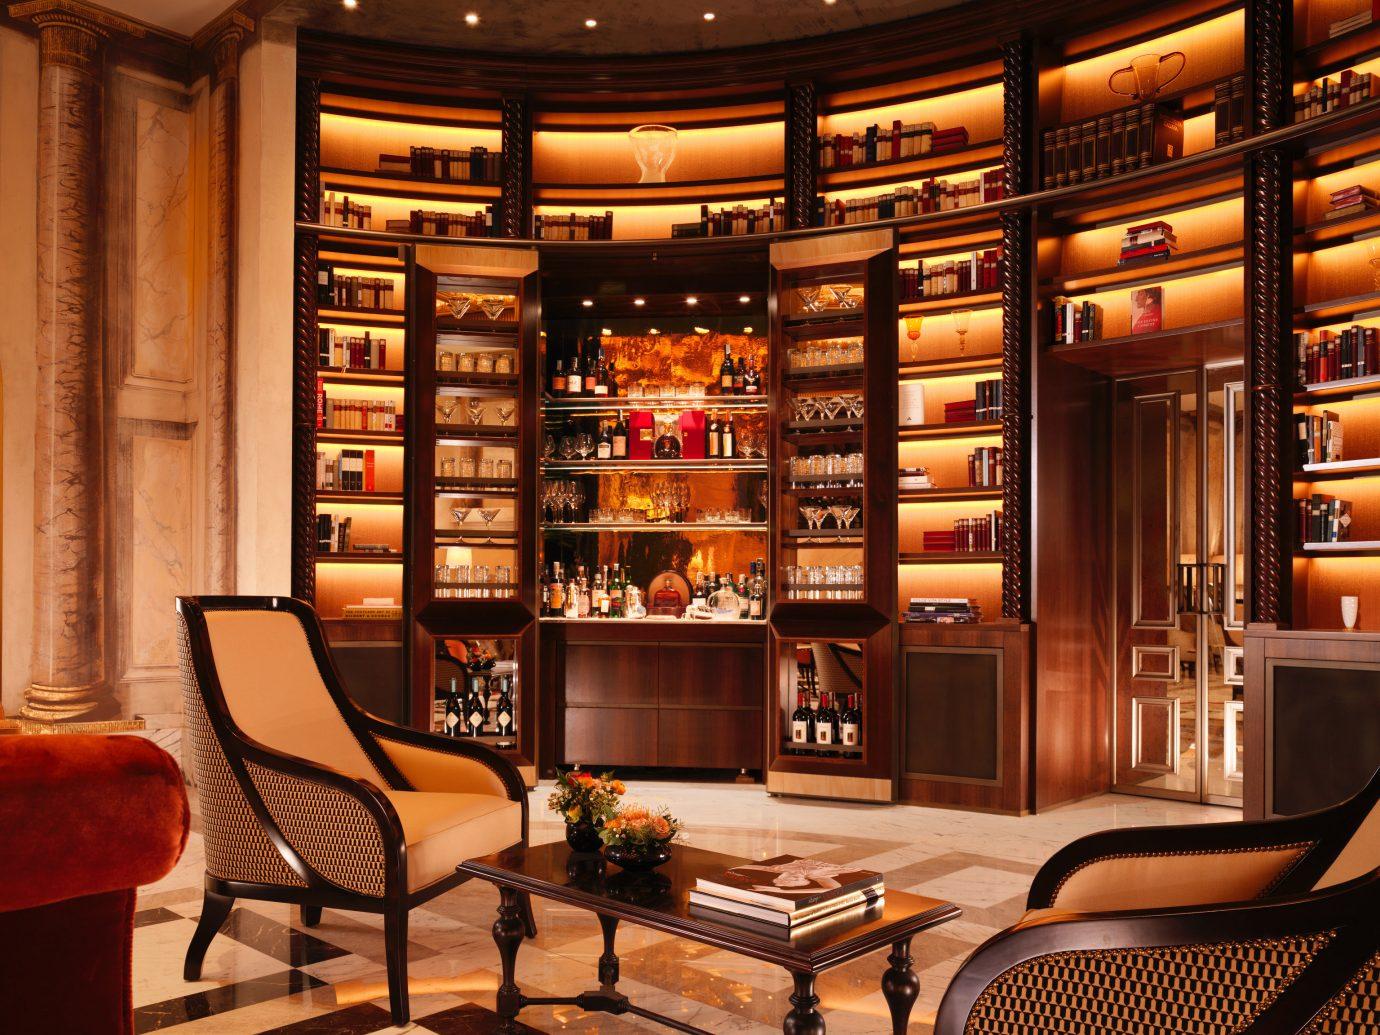 Boutique Hotels Hotels indoor chair room floor Living ceiling interior design furniture Lobby café area restaurant